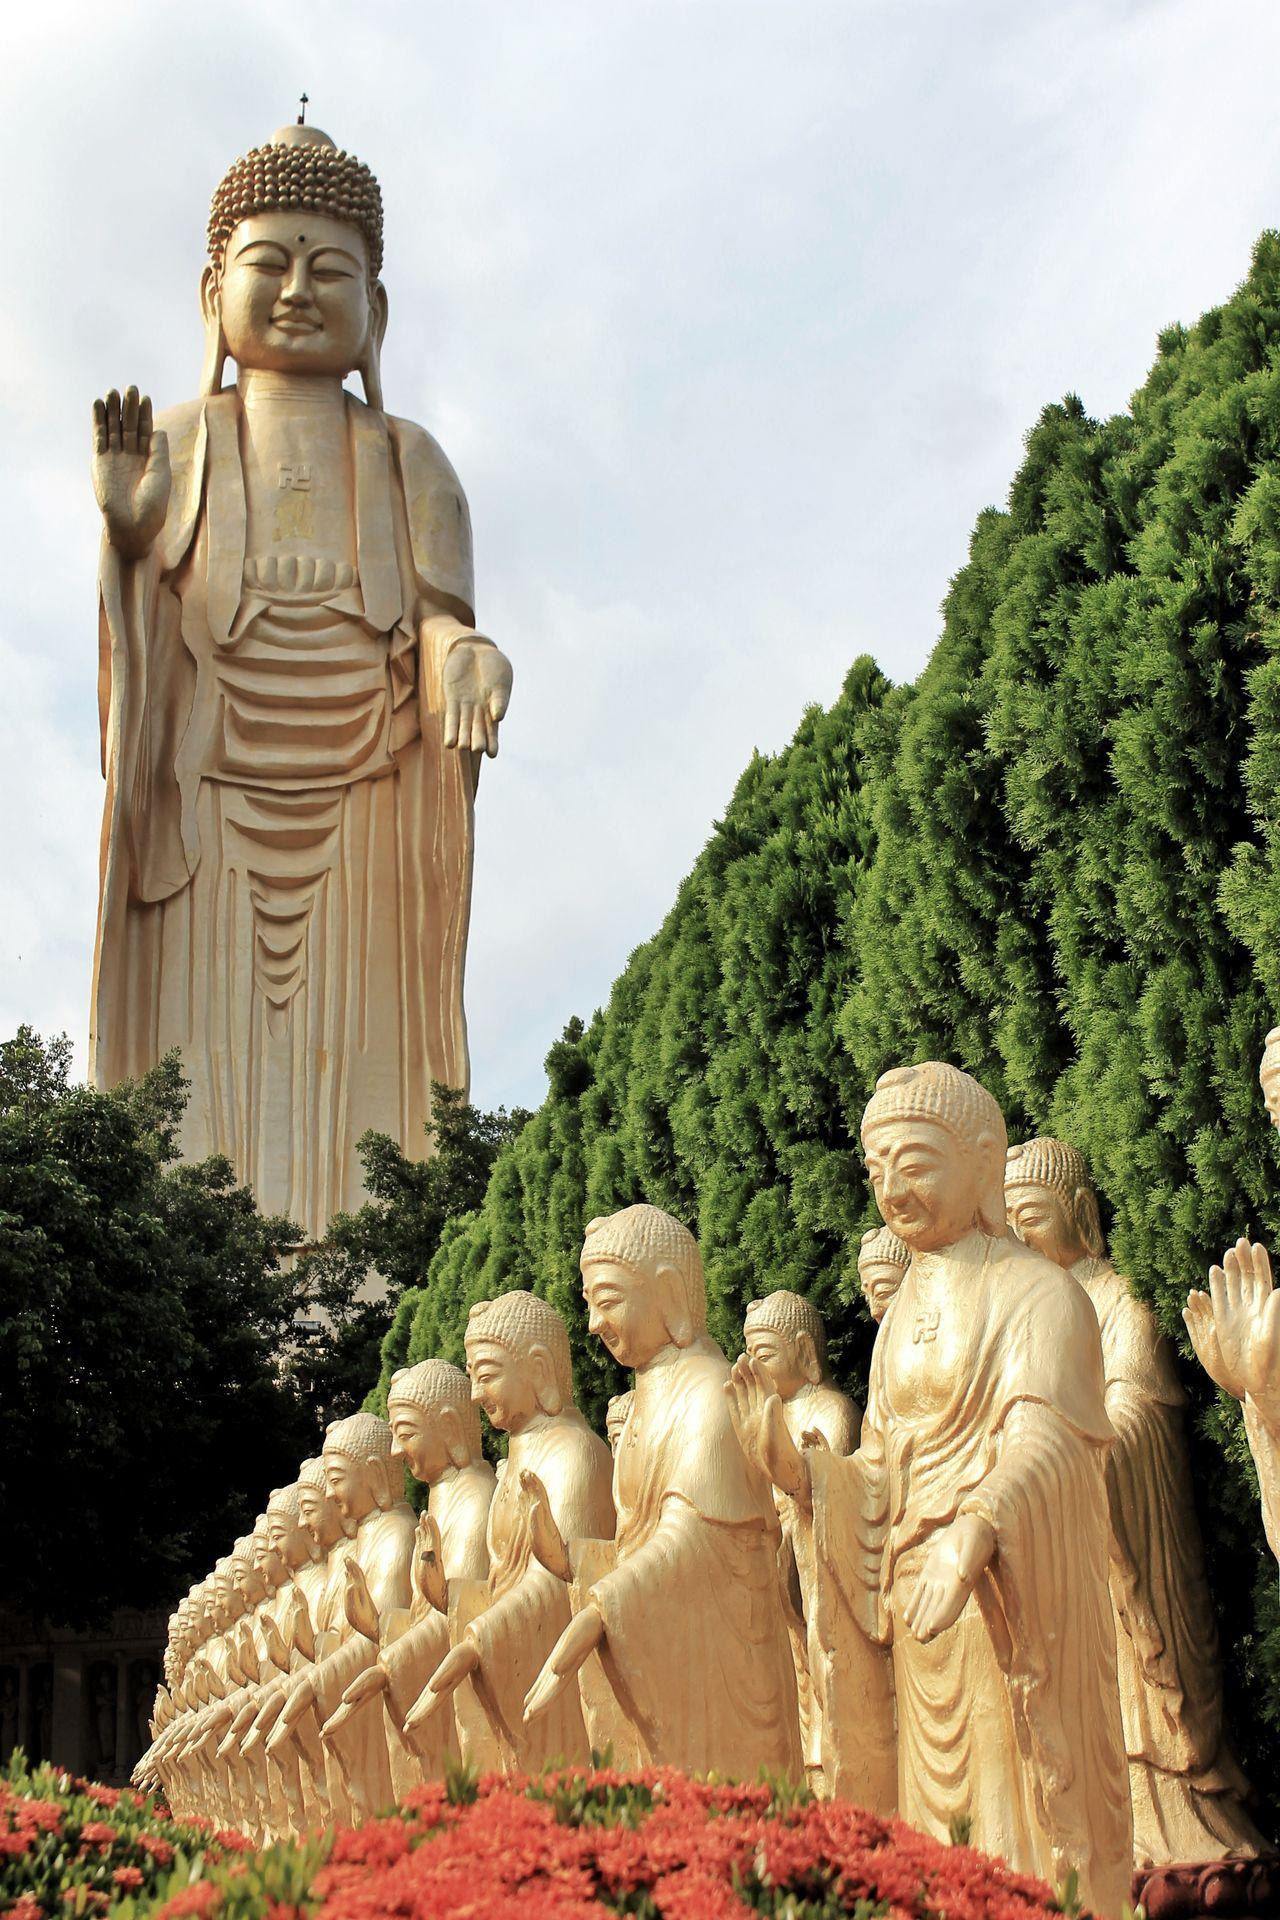 Fo Guang Shan Monastery, Statue Sculpture Buddha Statue Buddha Monastery Fo Guang Shan Taiwan Kaohsiung, Taiwan